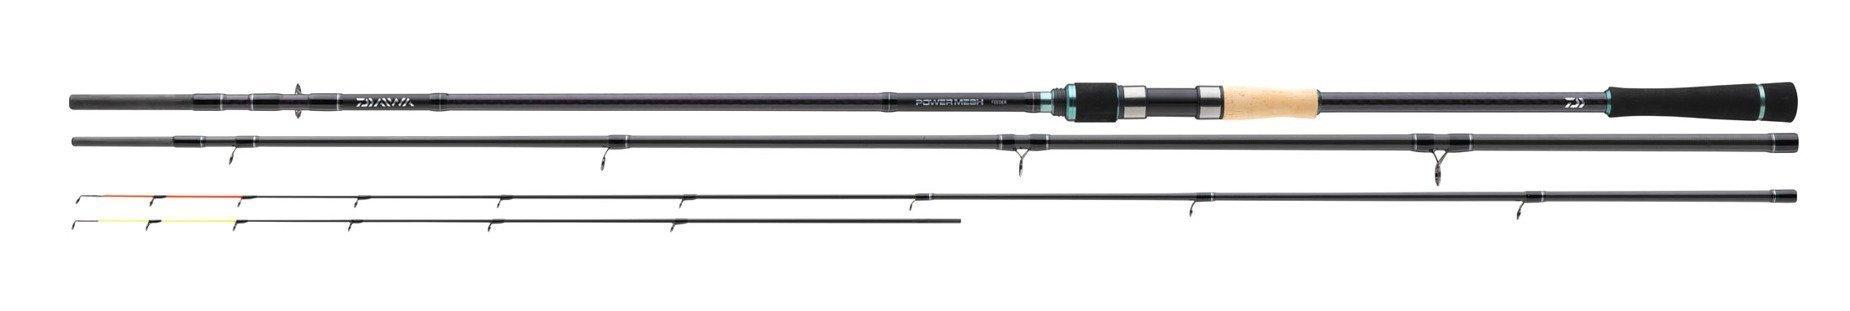 Daiwa Powermesh Feeder  390cm 150g